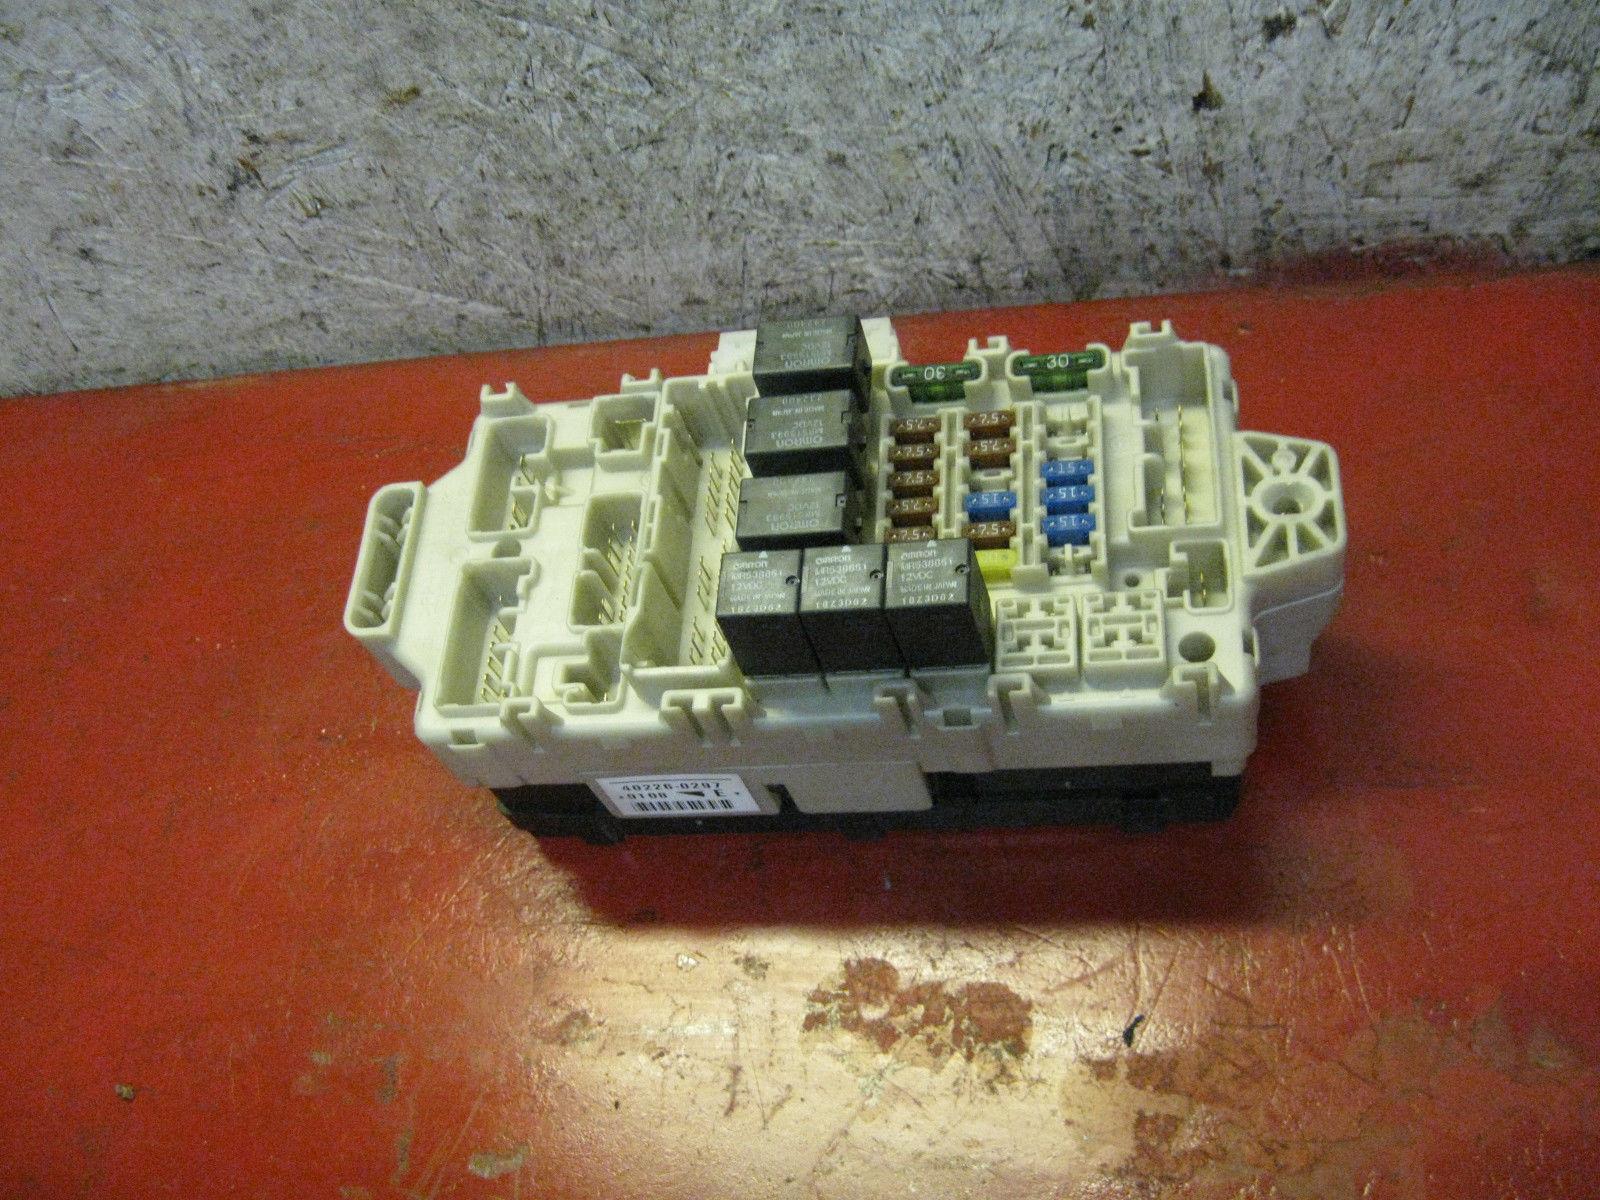 hight resolution of 04 mitsubishi galant interior fuse box panel and 11 similar items s l1600